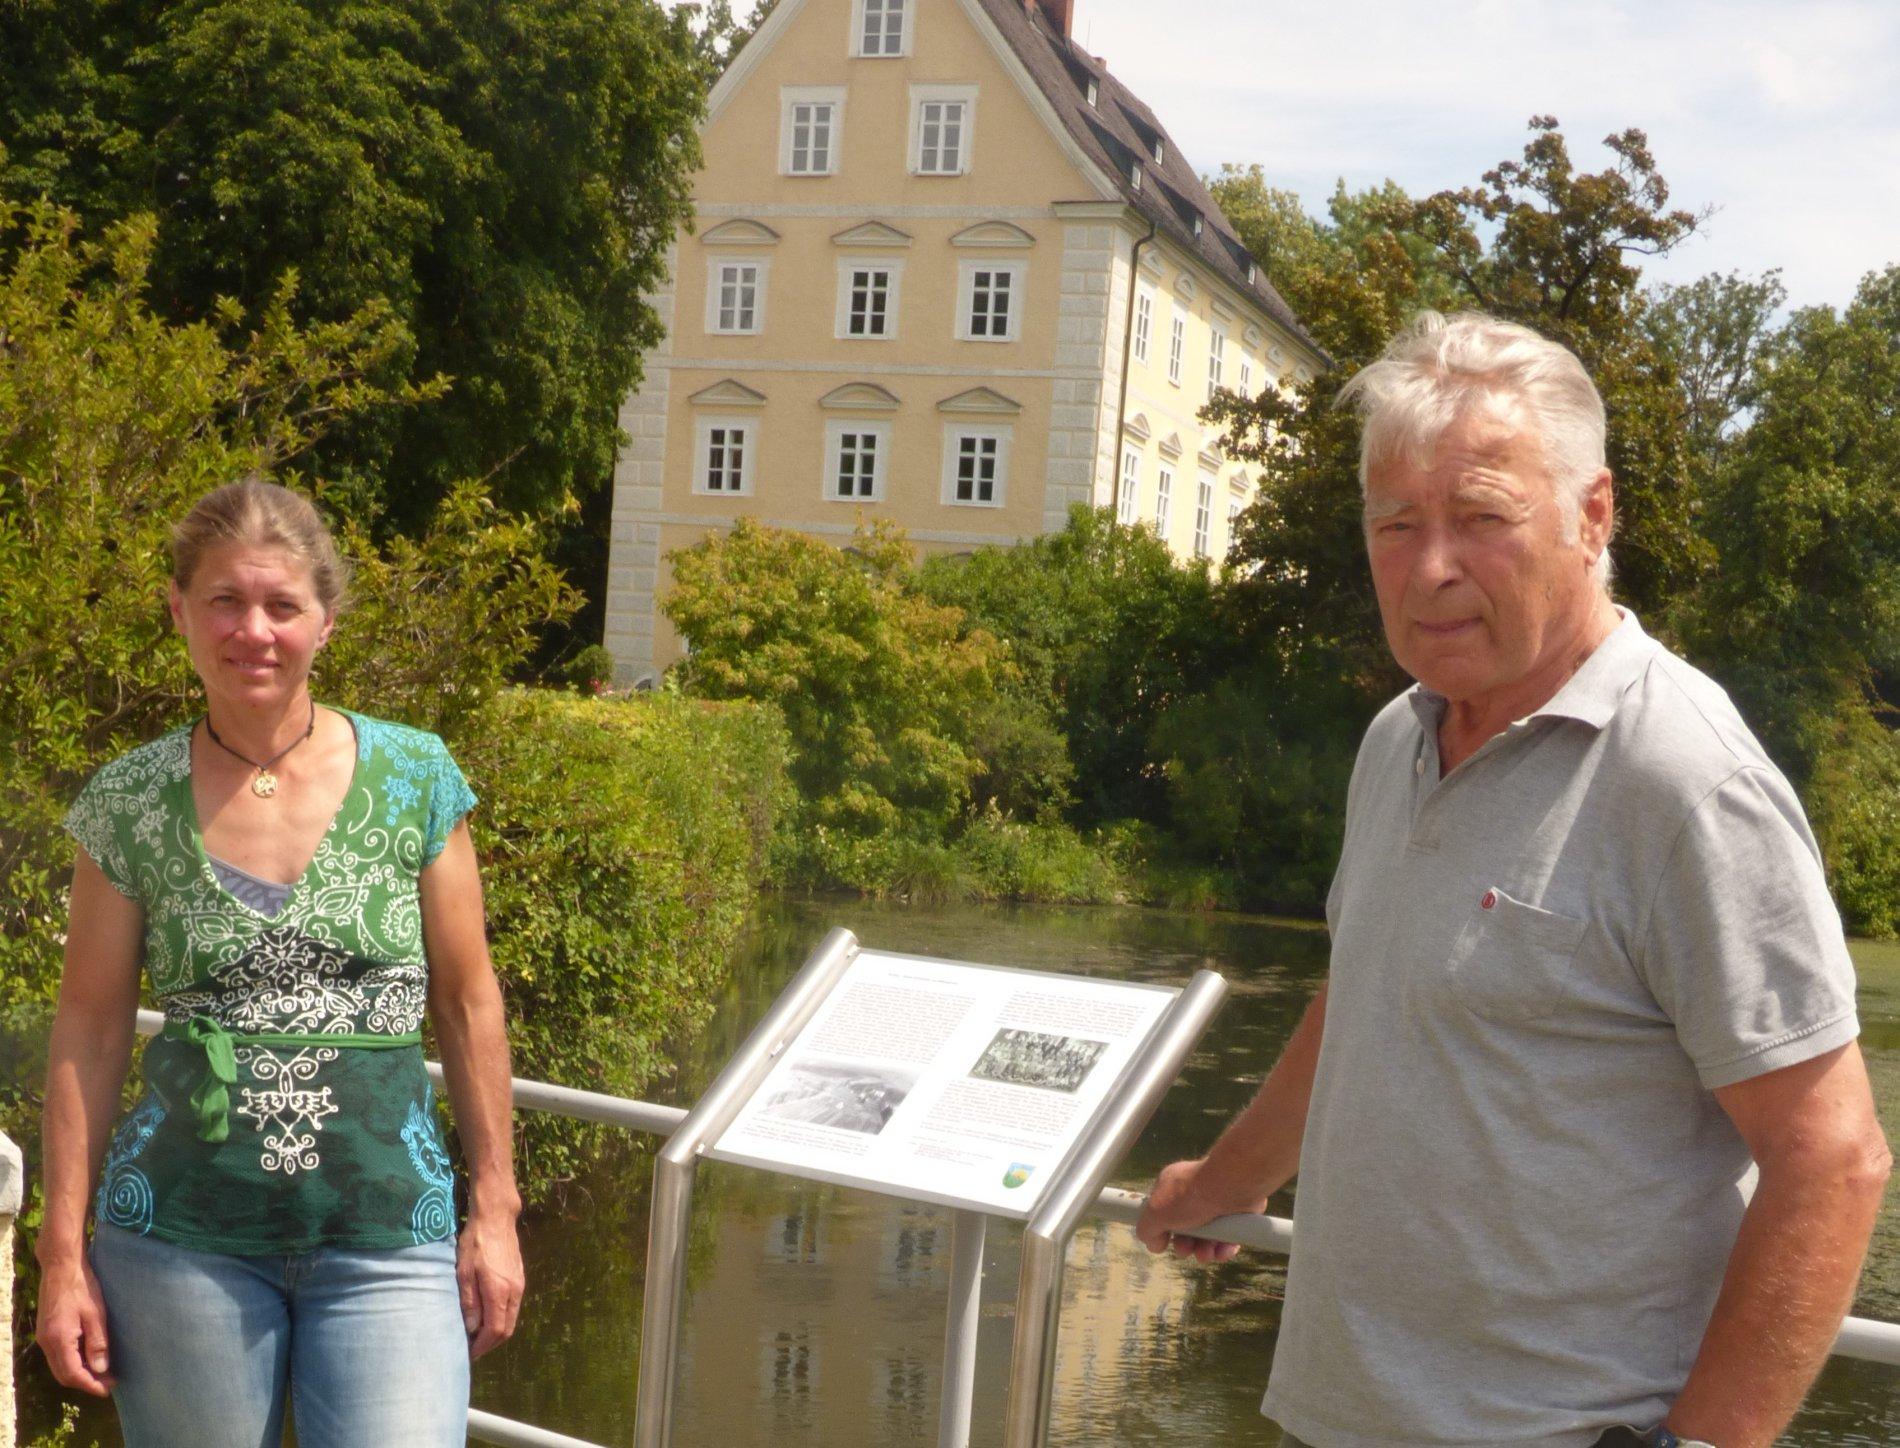 Informationstafel vor dem Schloss Erching